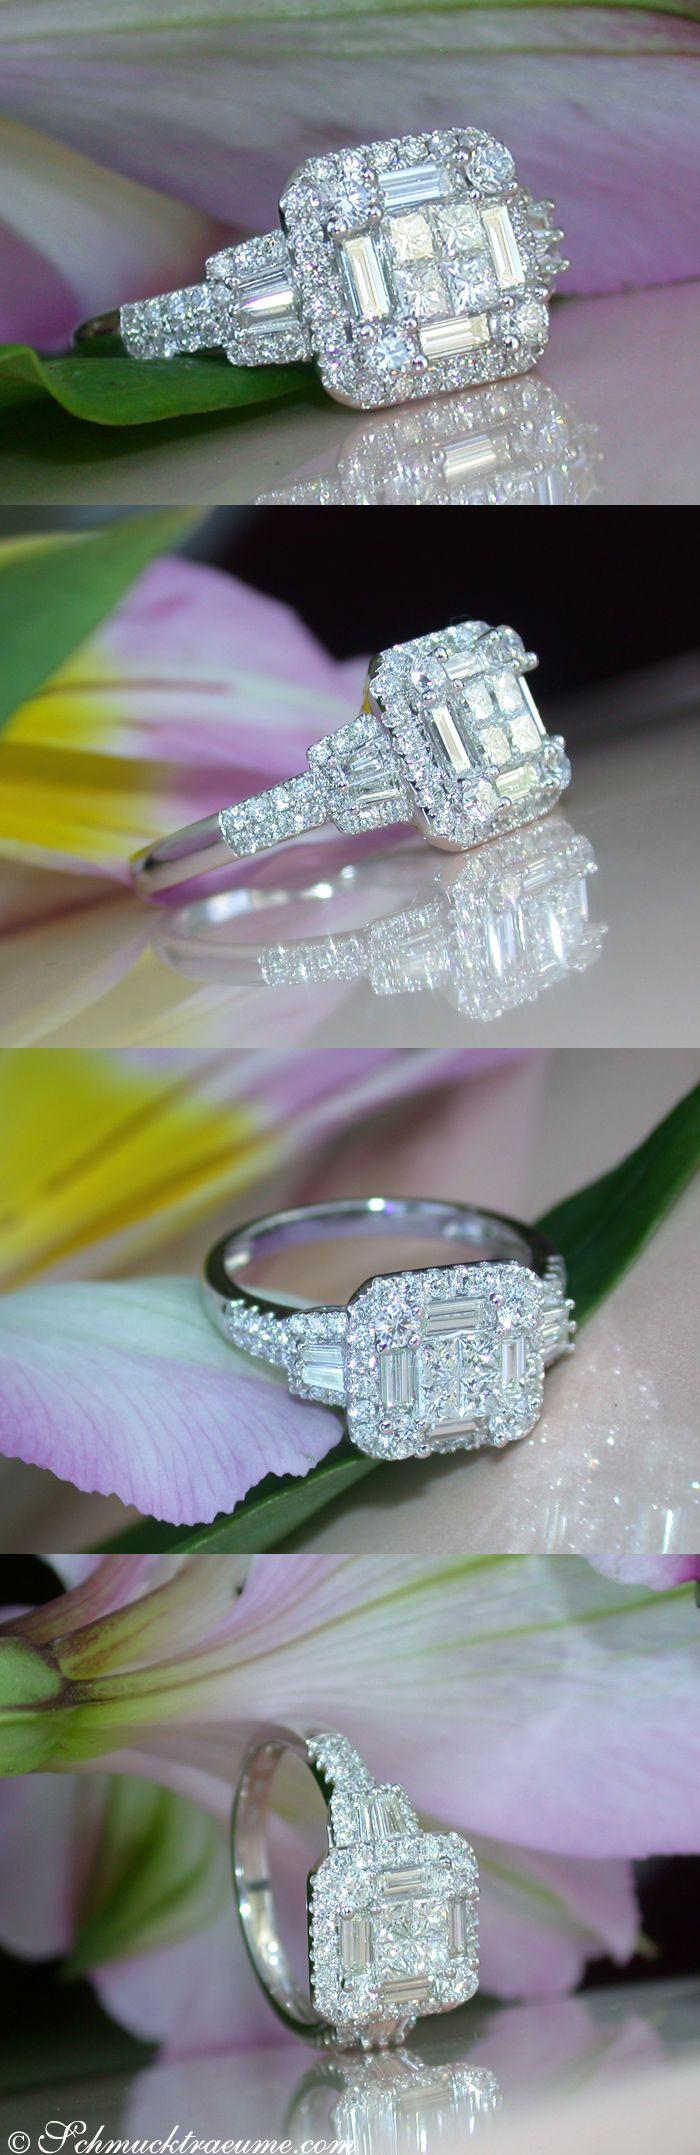 Enchanting Diamond Ring, Baguette, Princess & Brilliant Cut, 1.29 ct. TW-SI/VS WG18K - Visit: Schmucktraeume.com